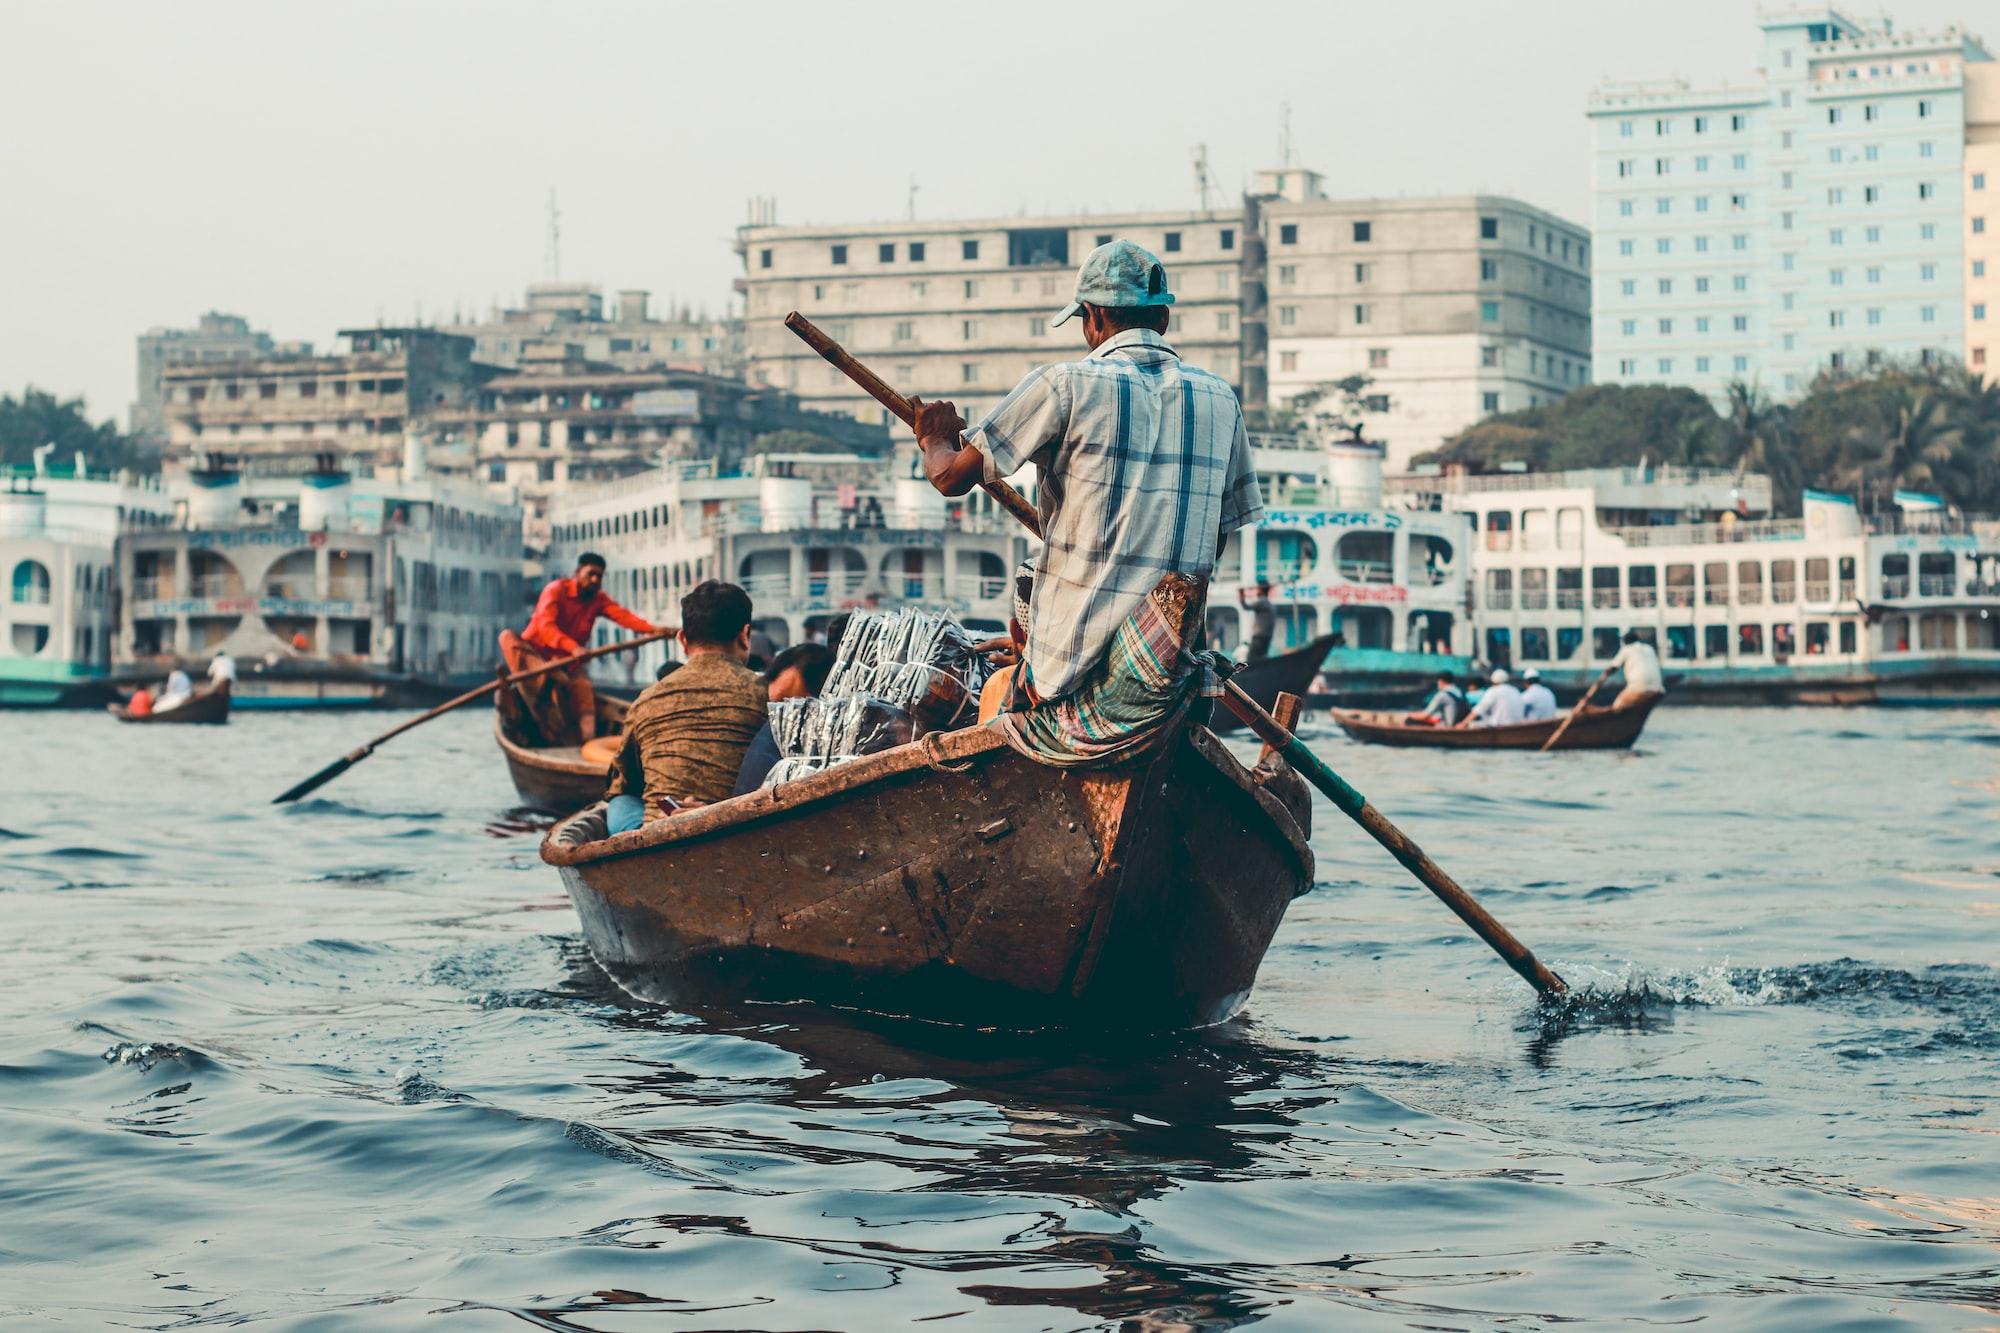 Bangladesh vs America on Social Media, Founder Rant